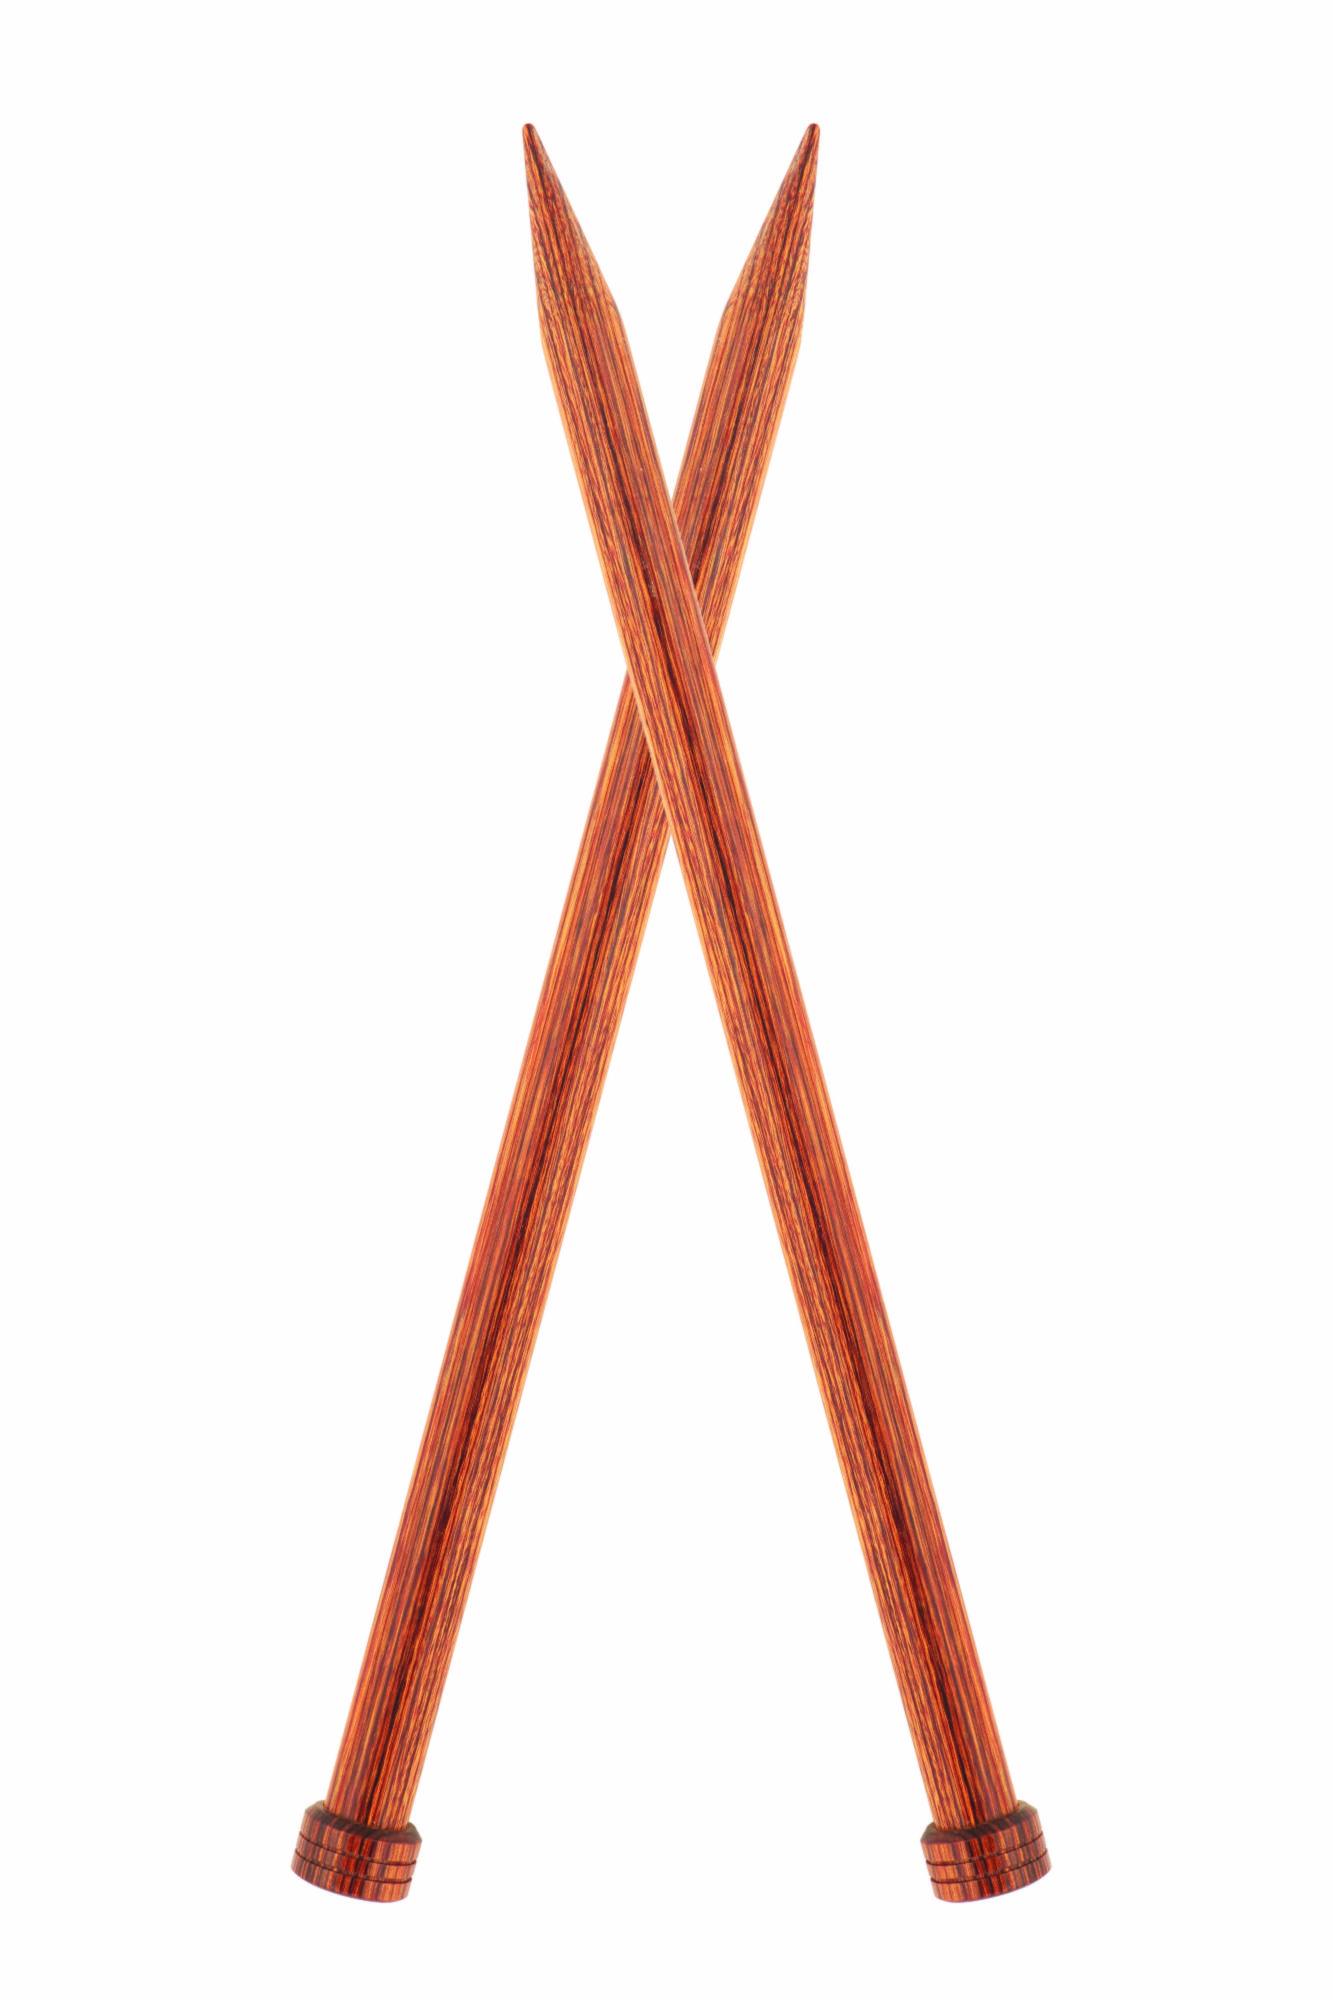 31145 Спицы прямые 4.00 мм - 25 см Ginger KnitPro